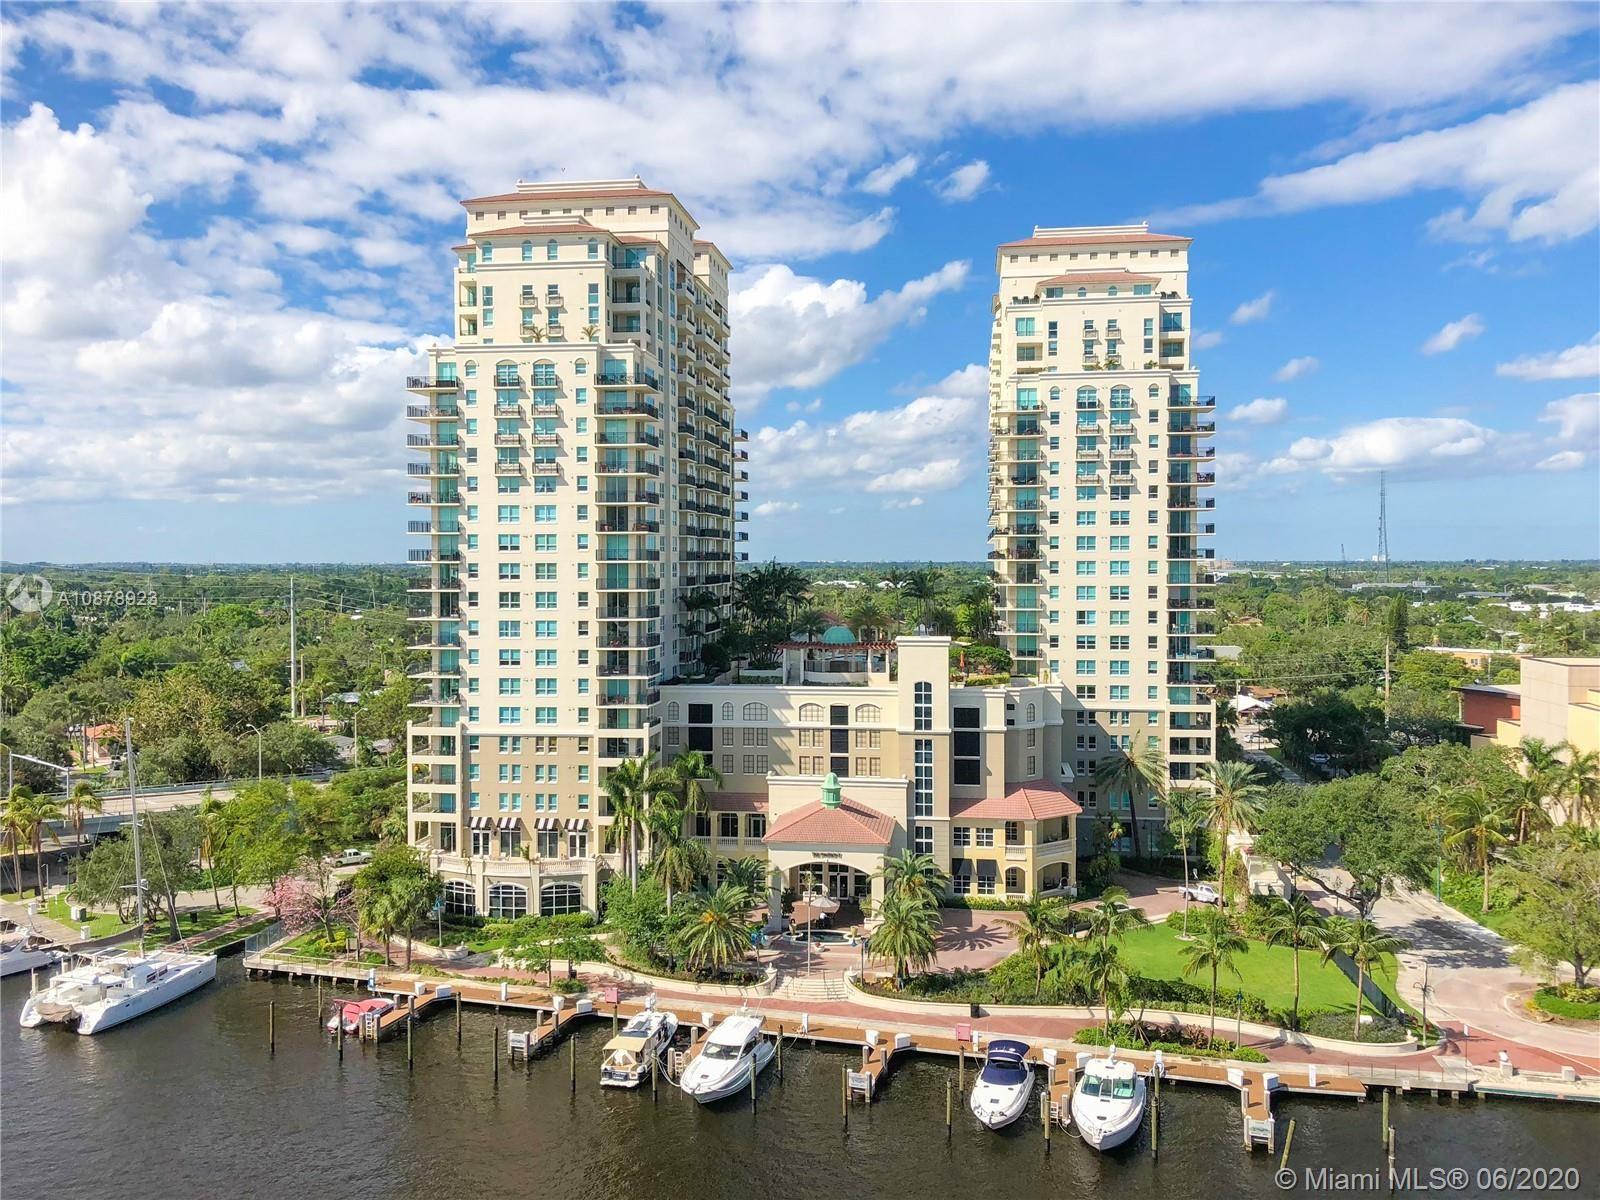 610 W Las Olas Blvd #1119N, Fort Lauderdale, FL 33312 - #: A10878923